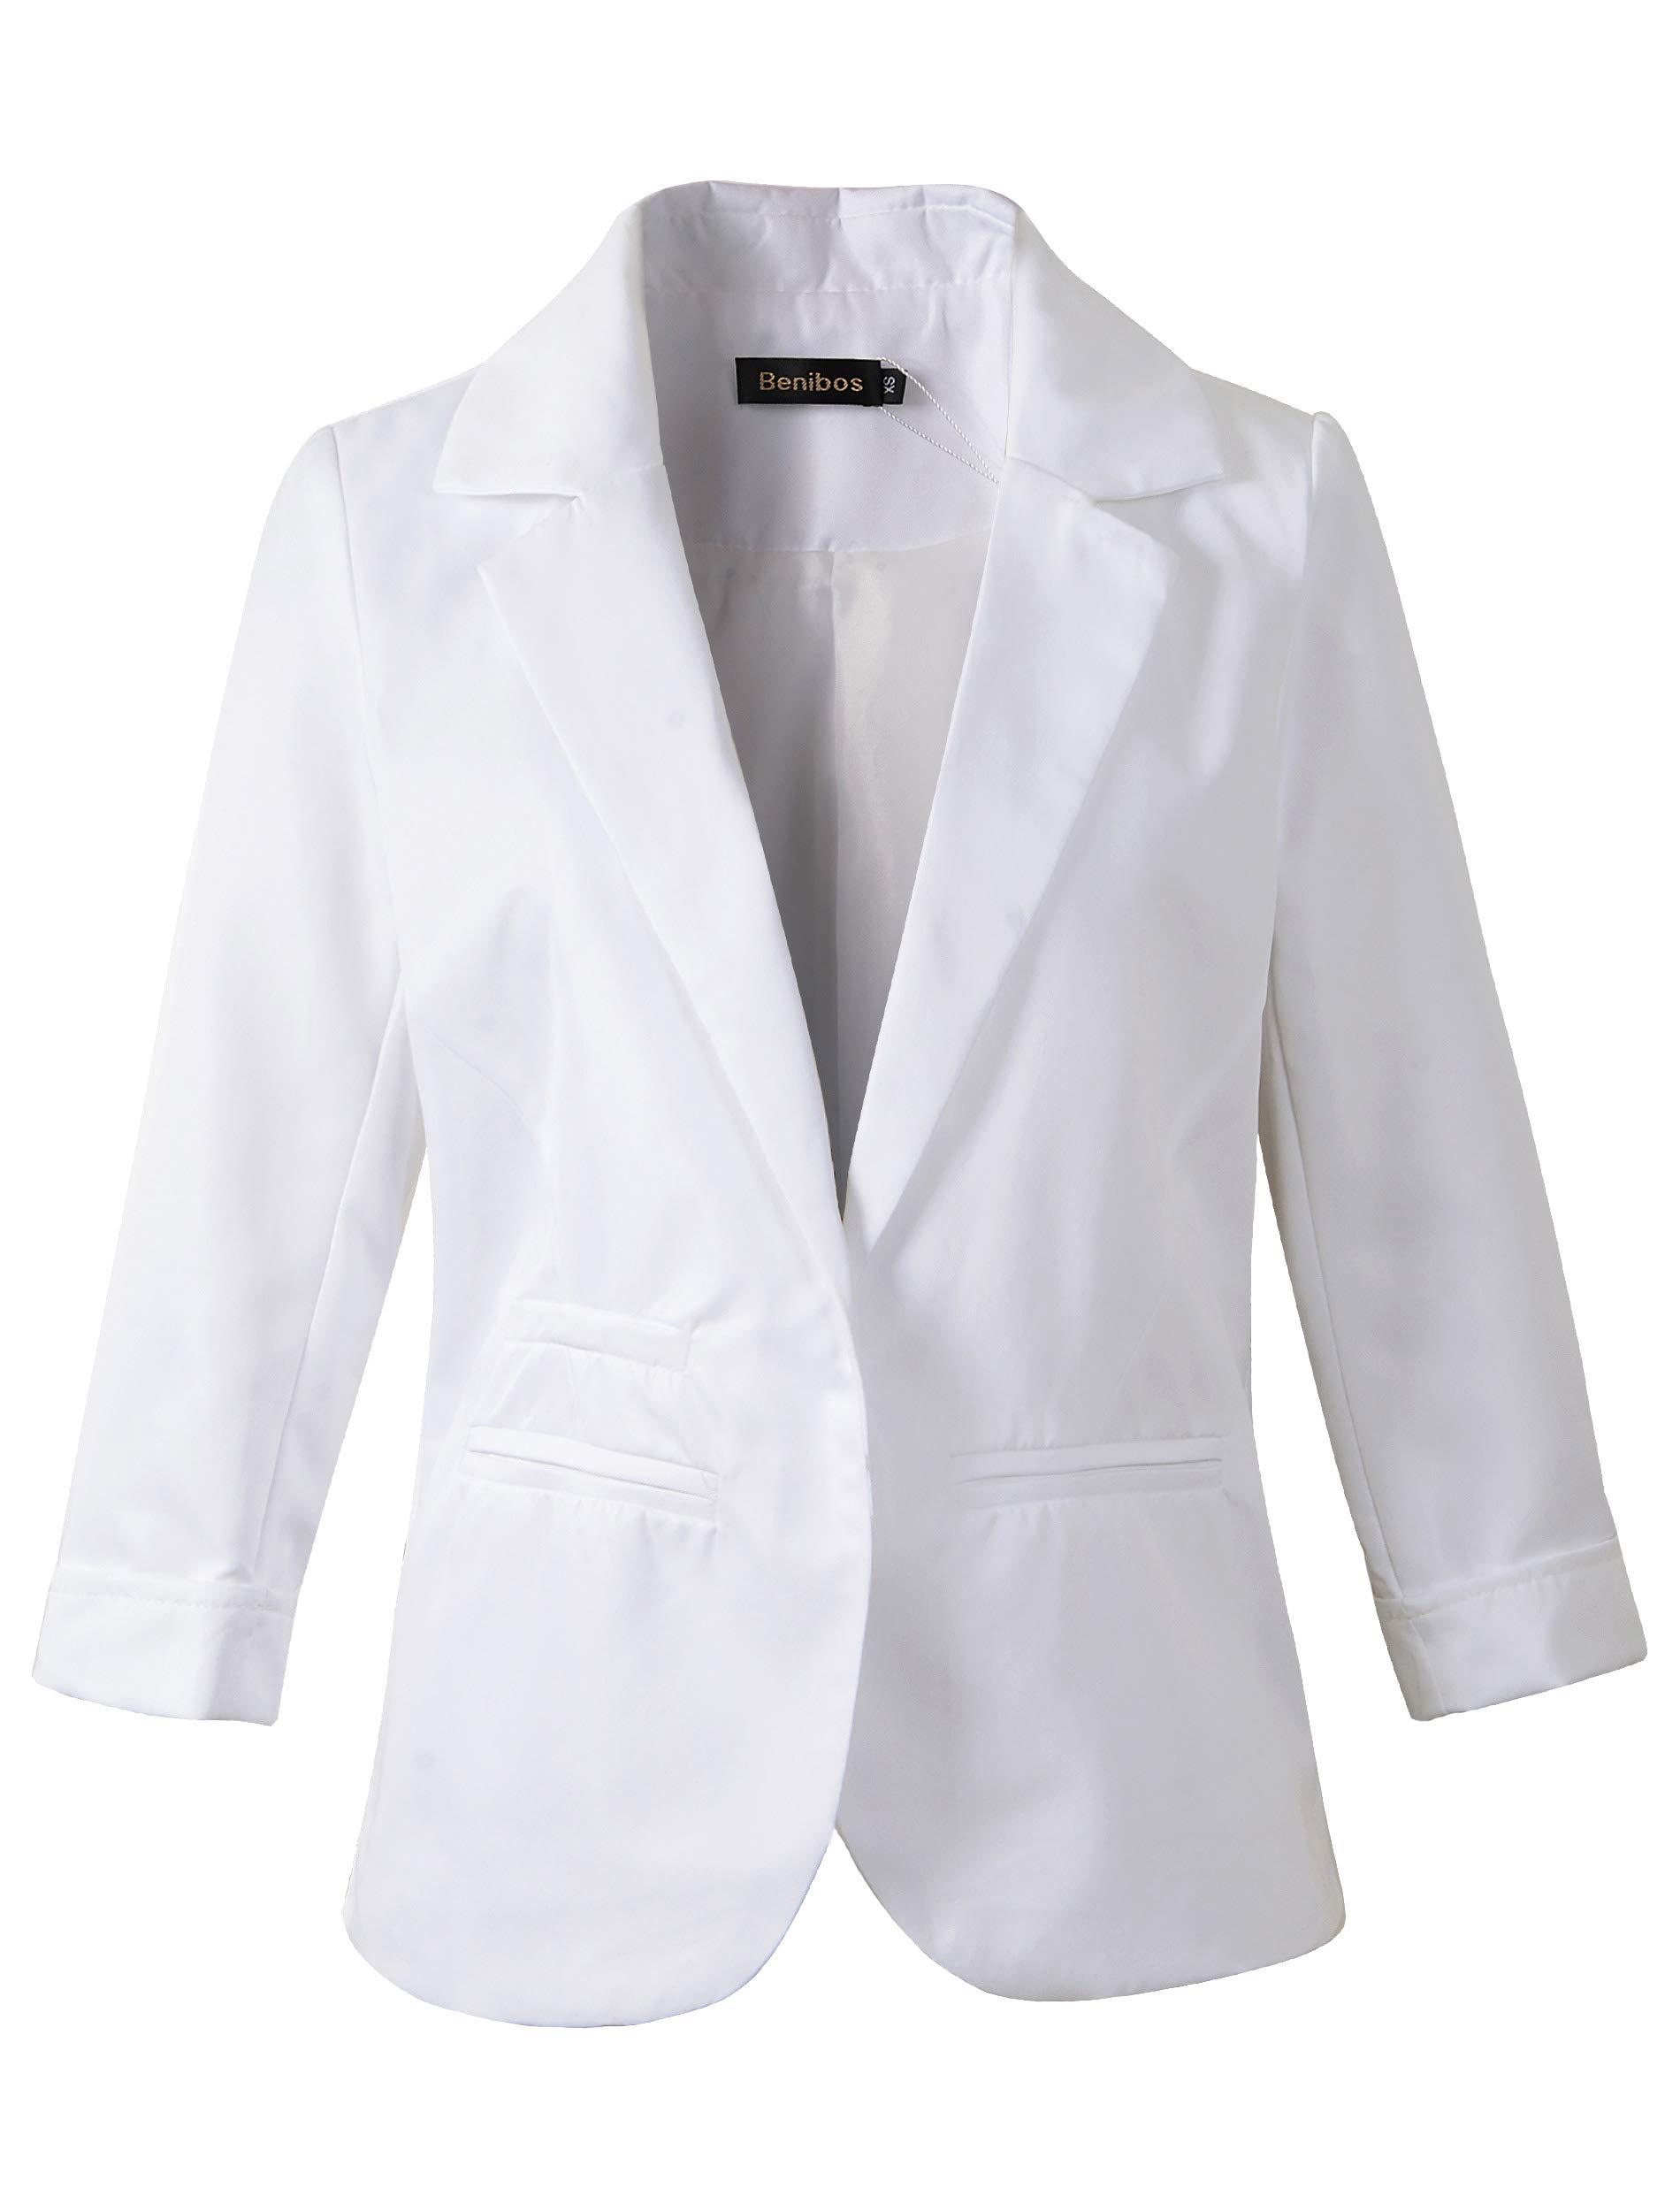 Women's Boyfriend Blazer Tailored Suit Coat Jacket (XL, 503White)